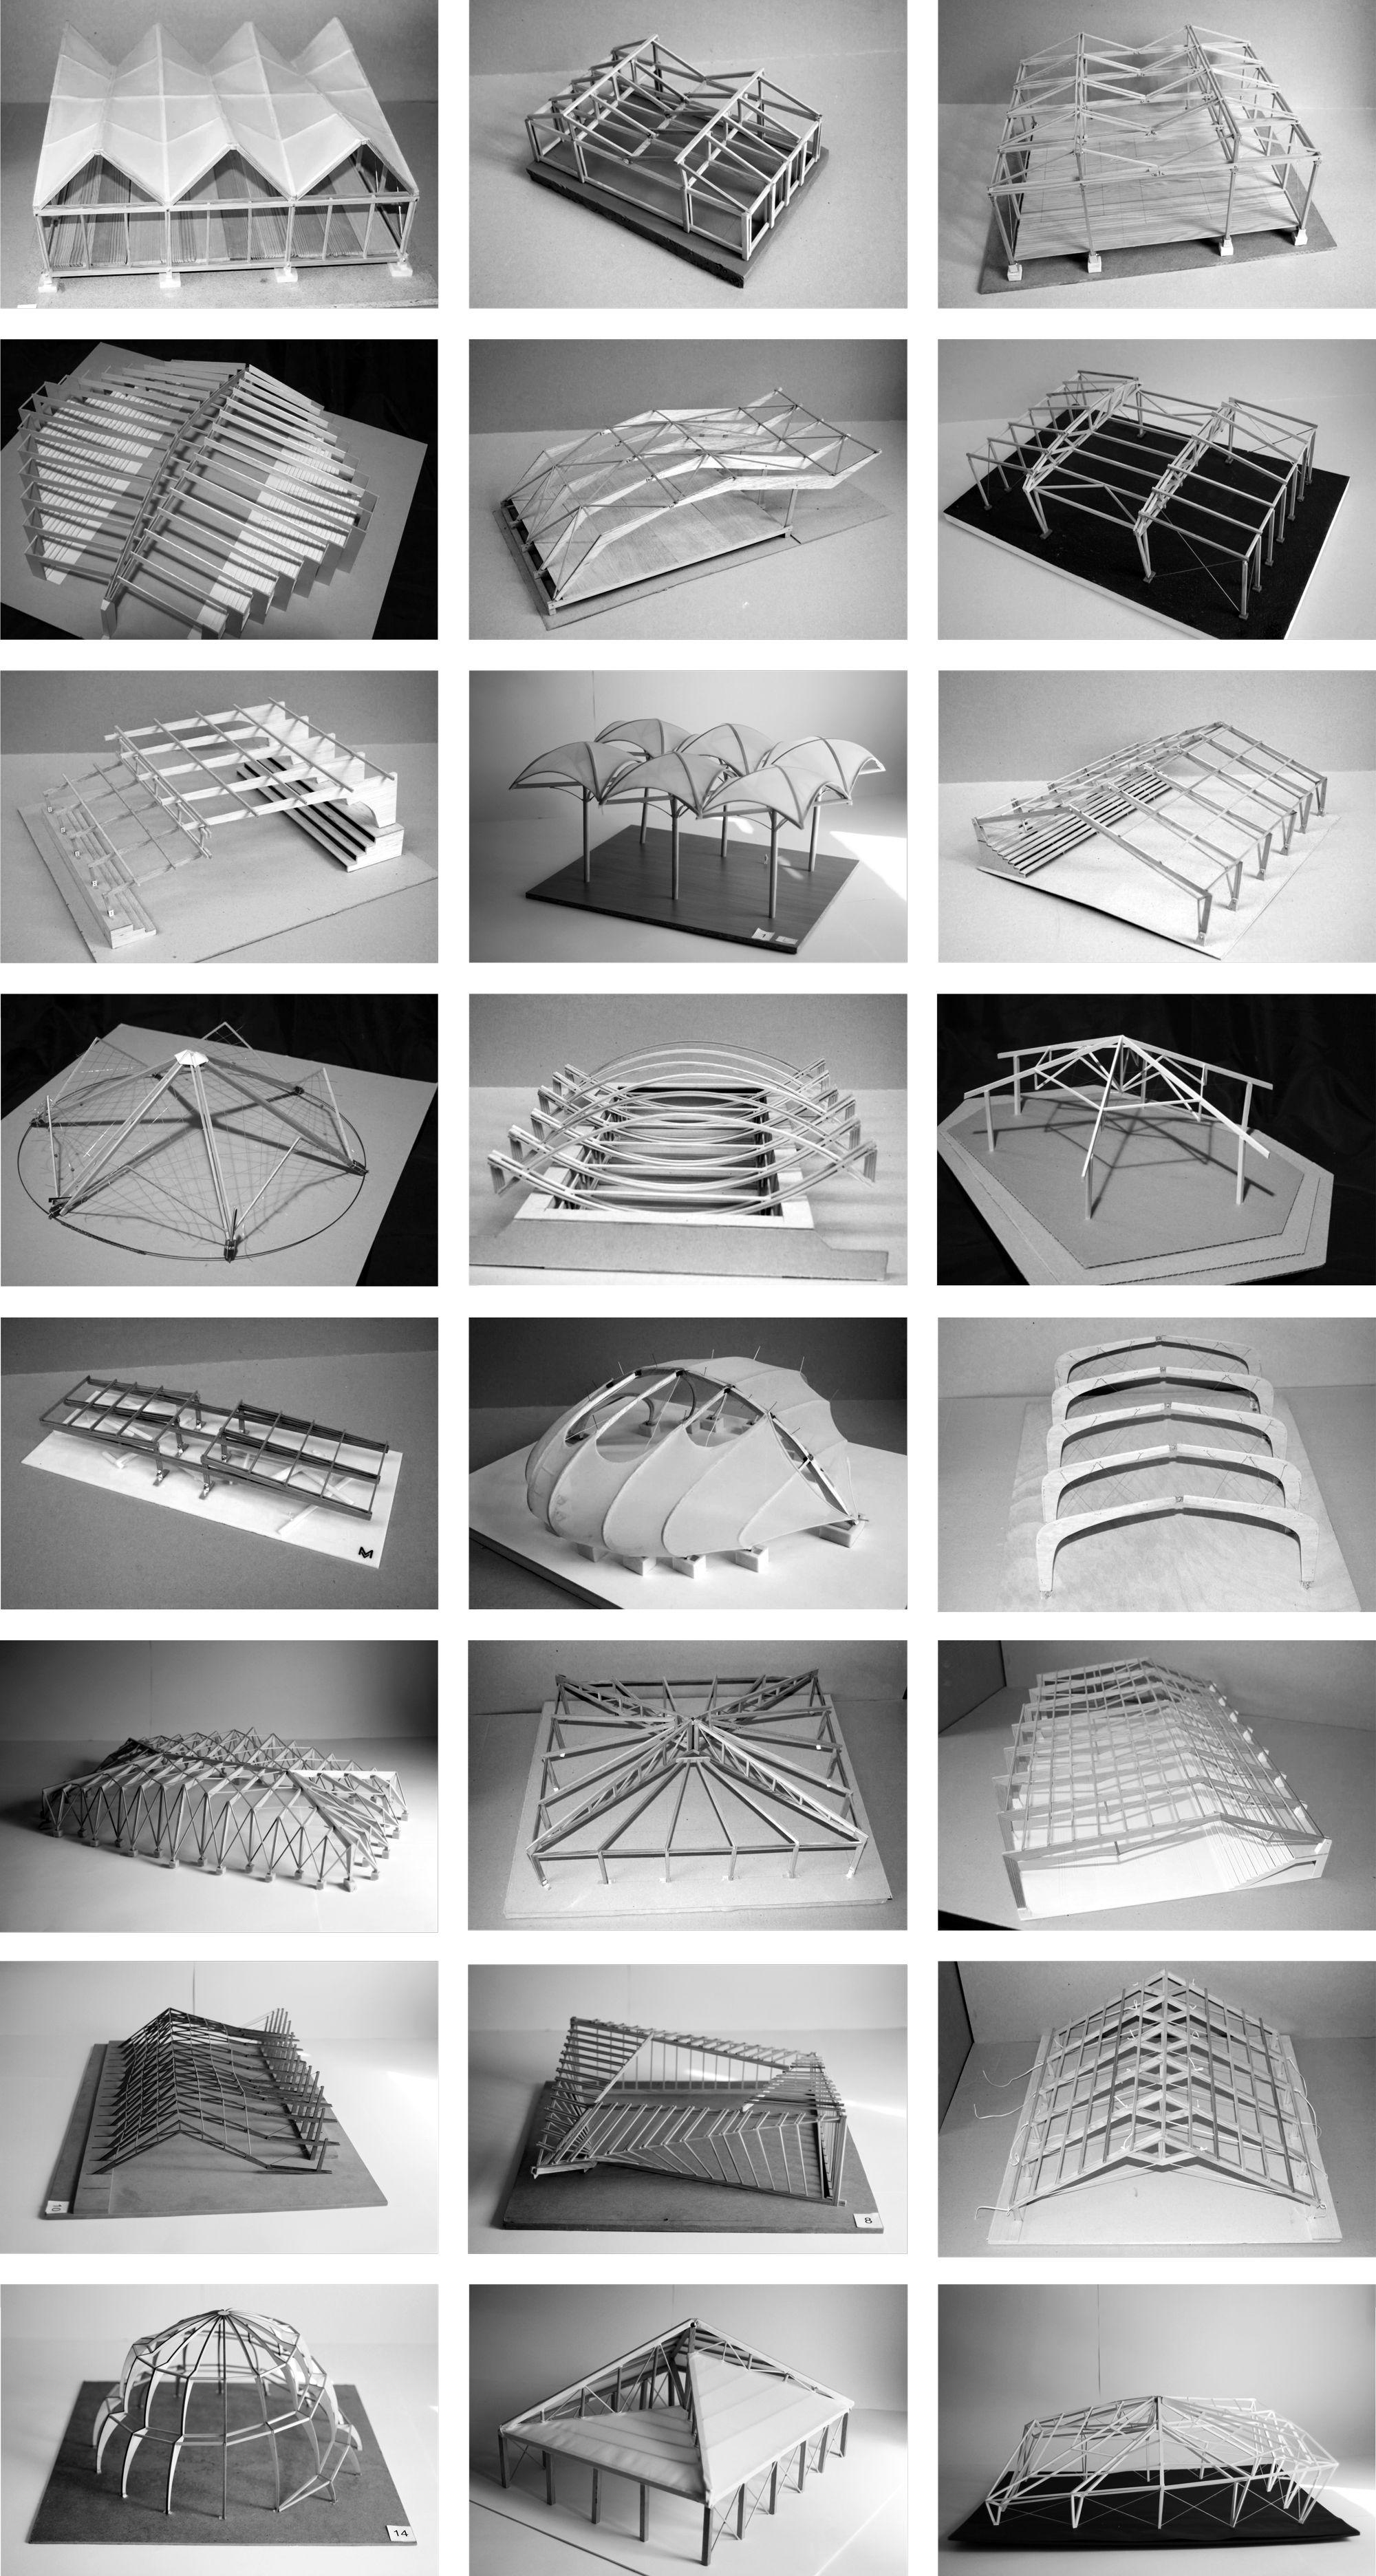 Sabah Shawkat, Architektonika (2015) #architektonischepräsentation